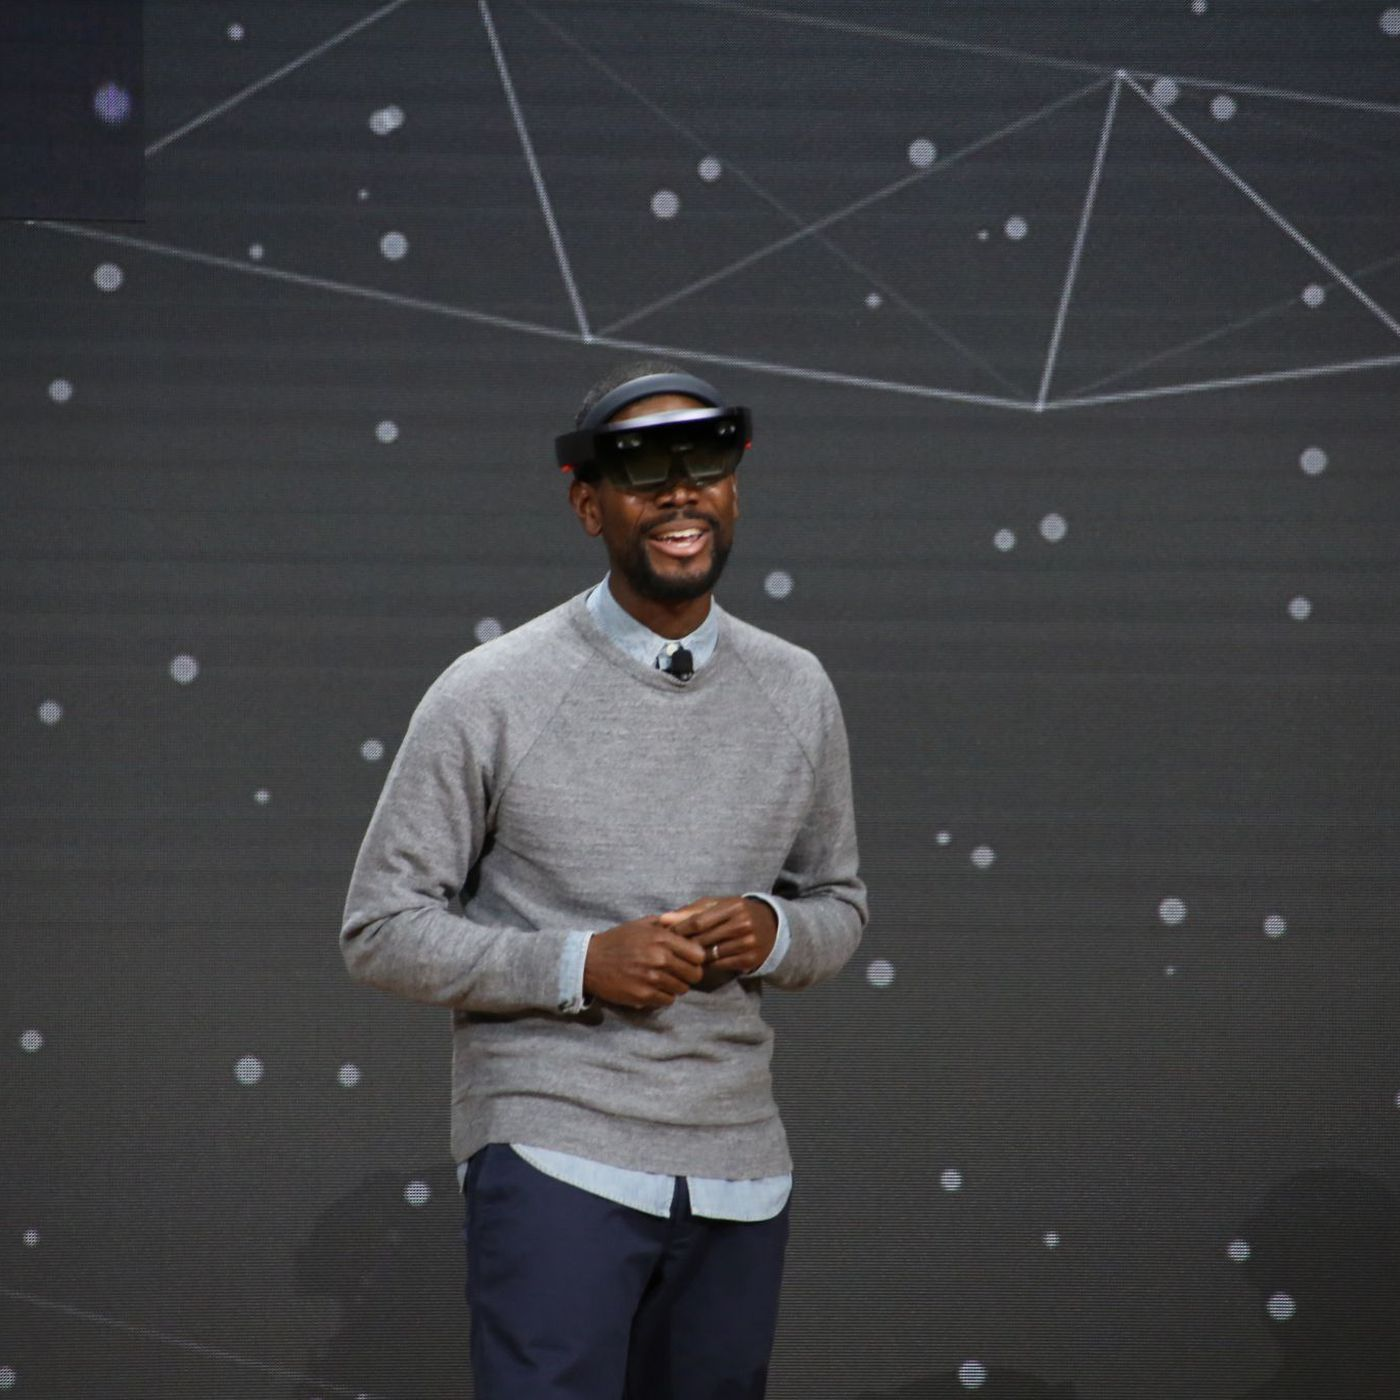 Microsoft demonstrates VR, mixed reality and HoloLens at